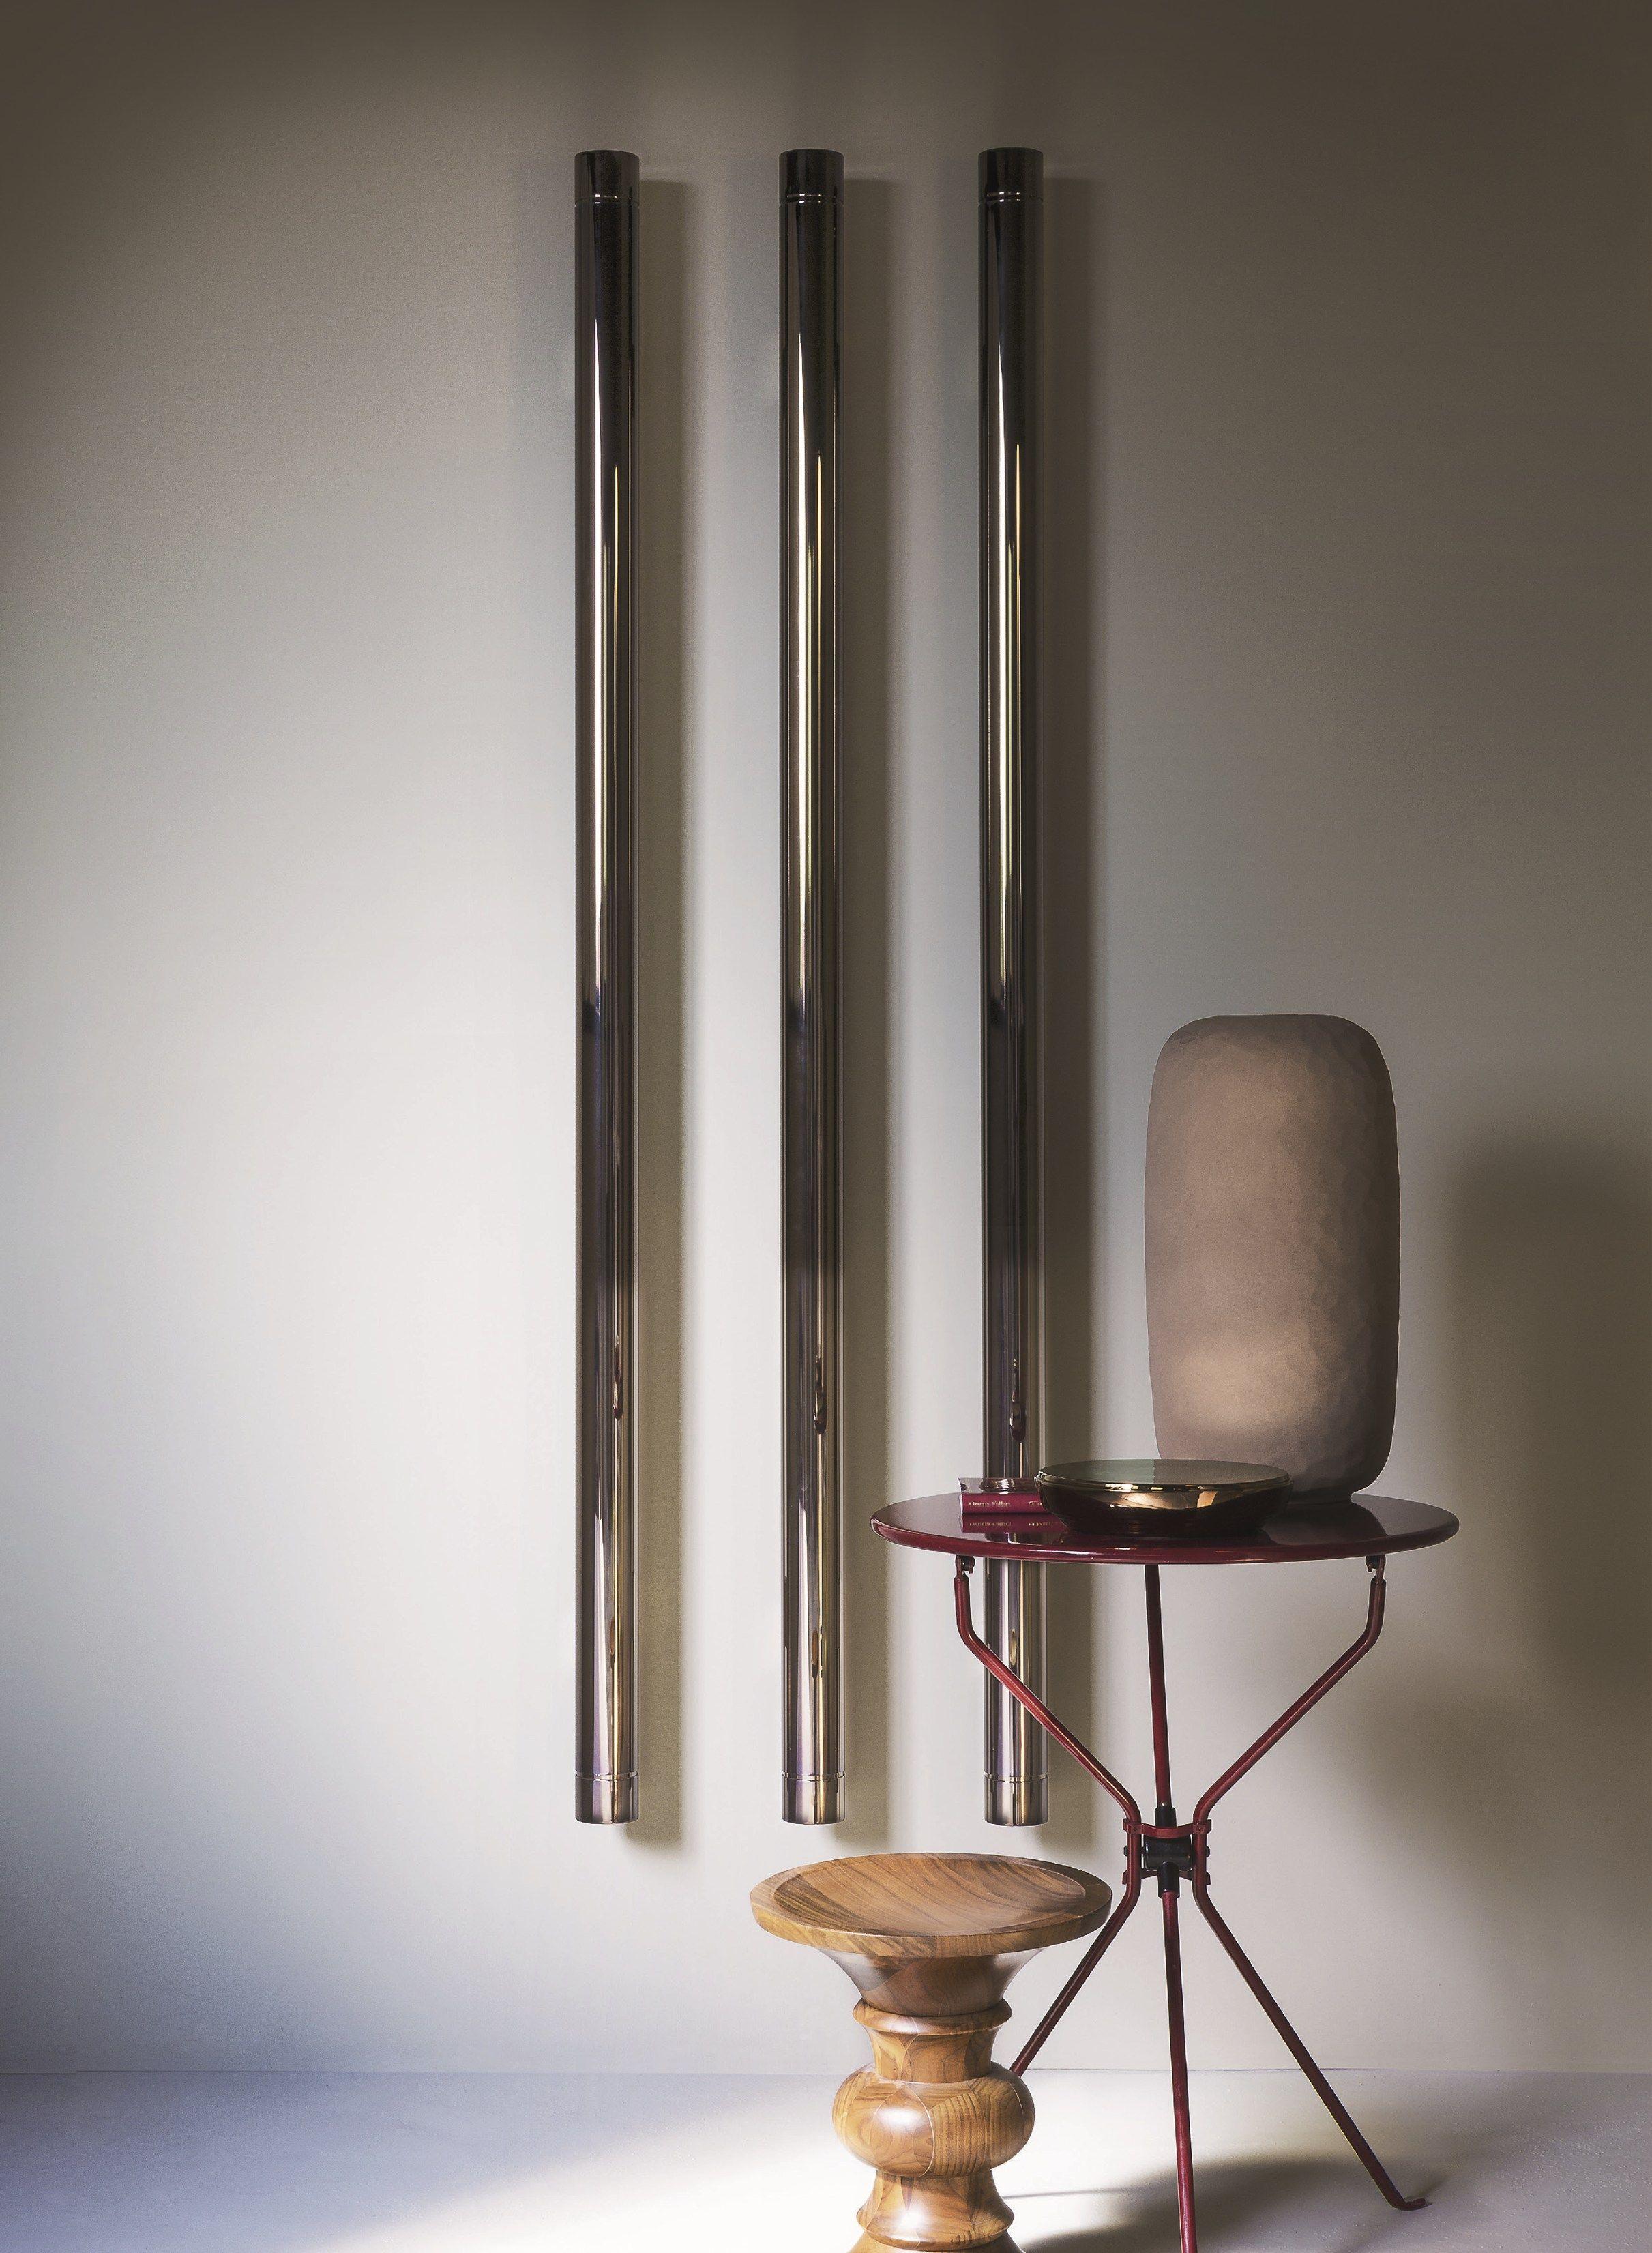 T b t vertical decorative radiator by tubes radiatori for Termosifoni tubes